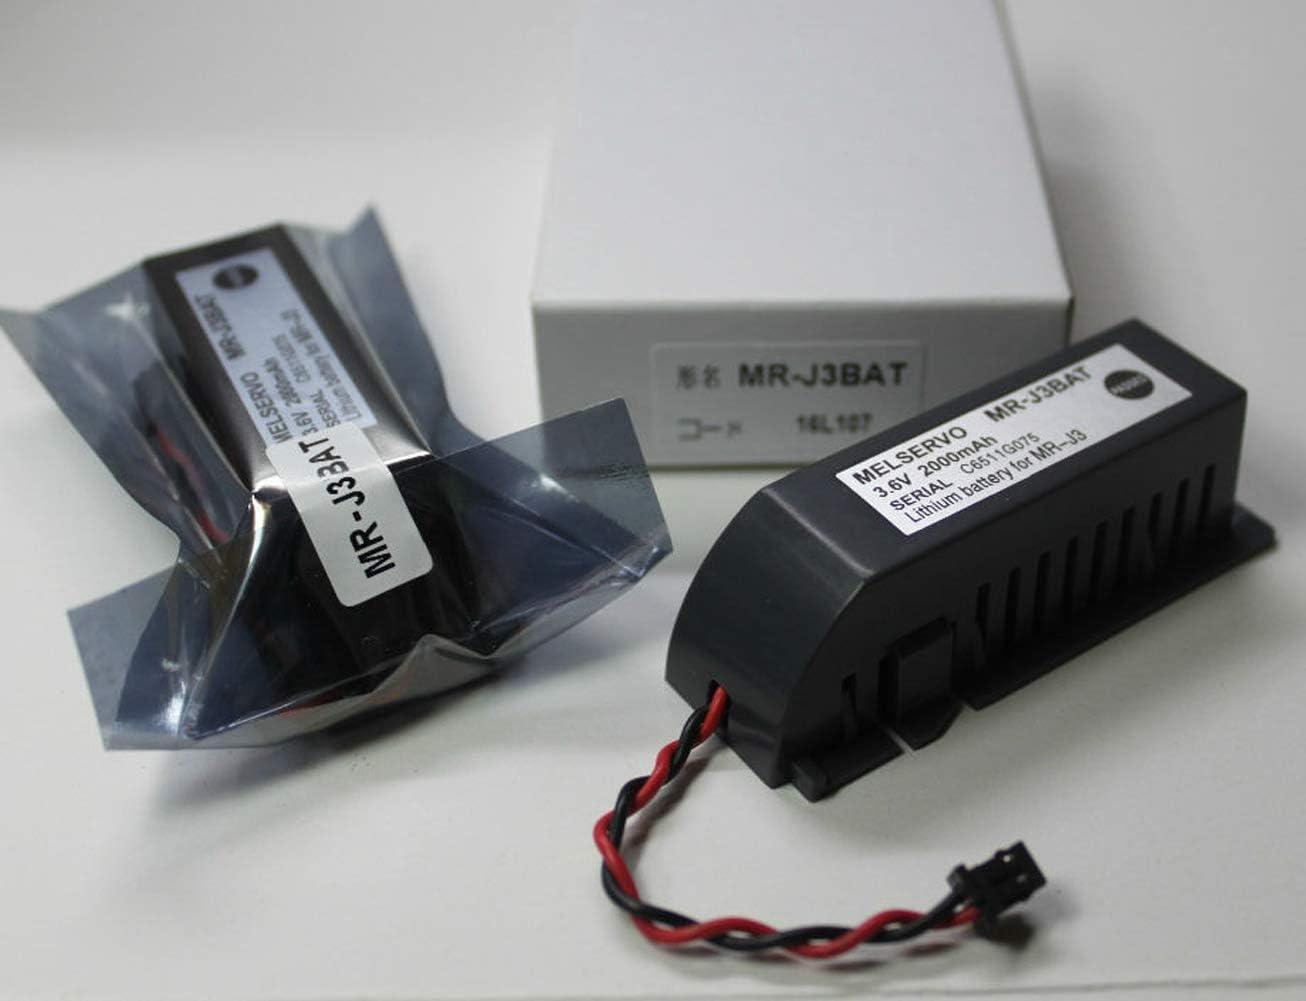 12.8mm TiN COATED JOBBER DRILL BIT HSS GOLDEX EUROPA TOOL OSBORN 8105041280  12